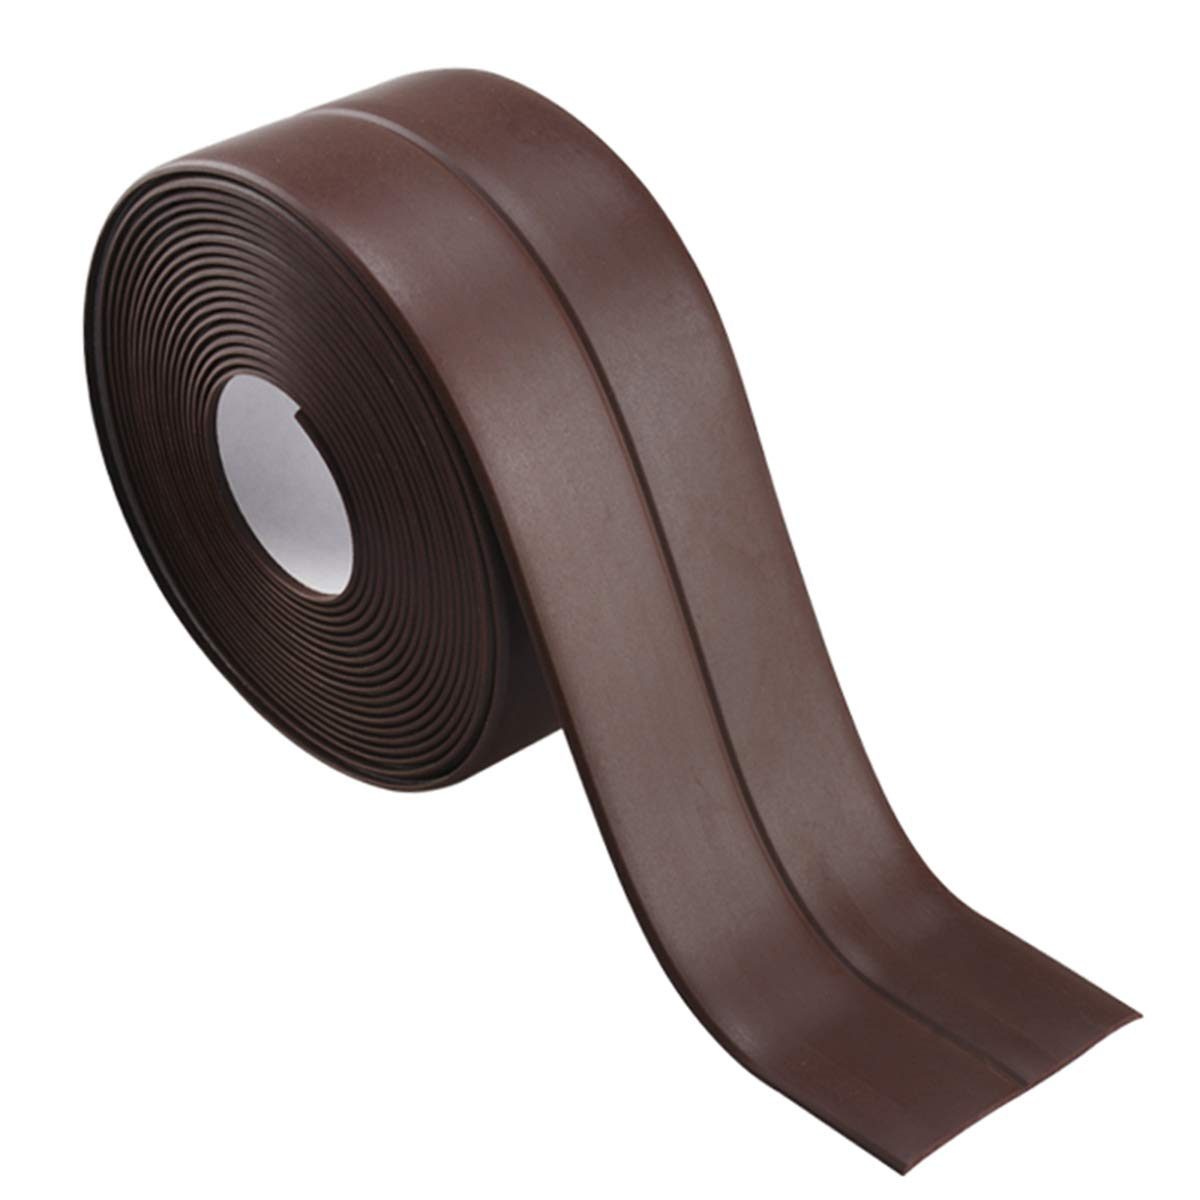 Dooppa Self-Adhesive Caulk Strip, Tub and Wall Sealing Tape Caulk Sealer for Bathroom, Kitchen and Toilet (38mm Width x 3.35m Lenth) (White)